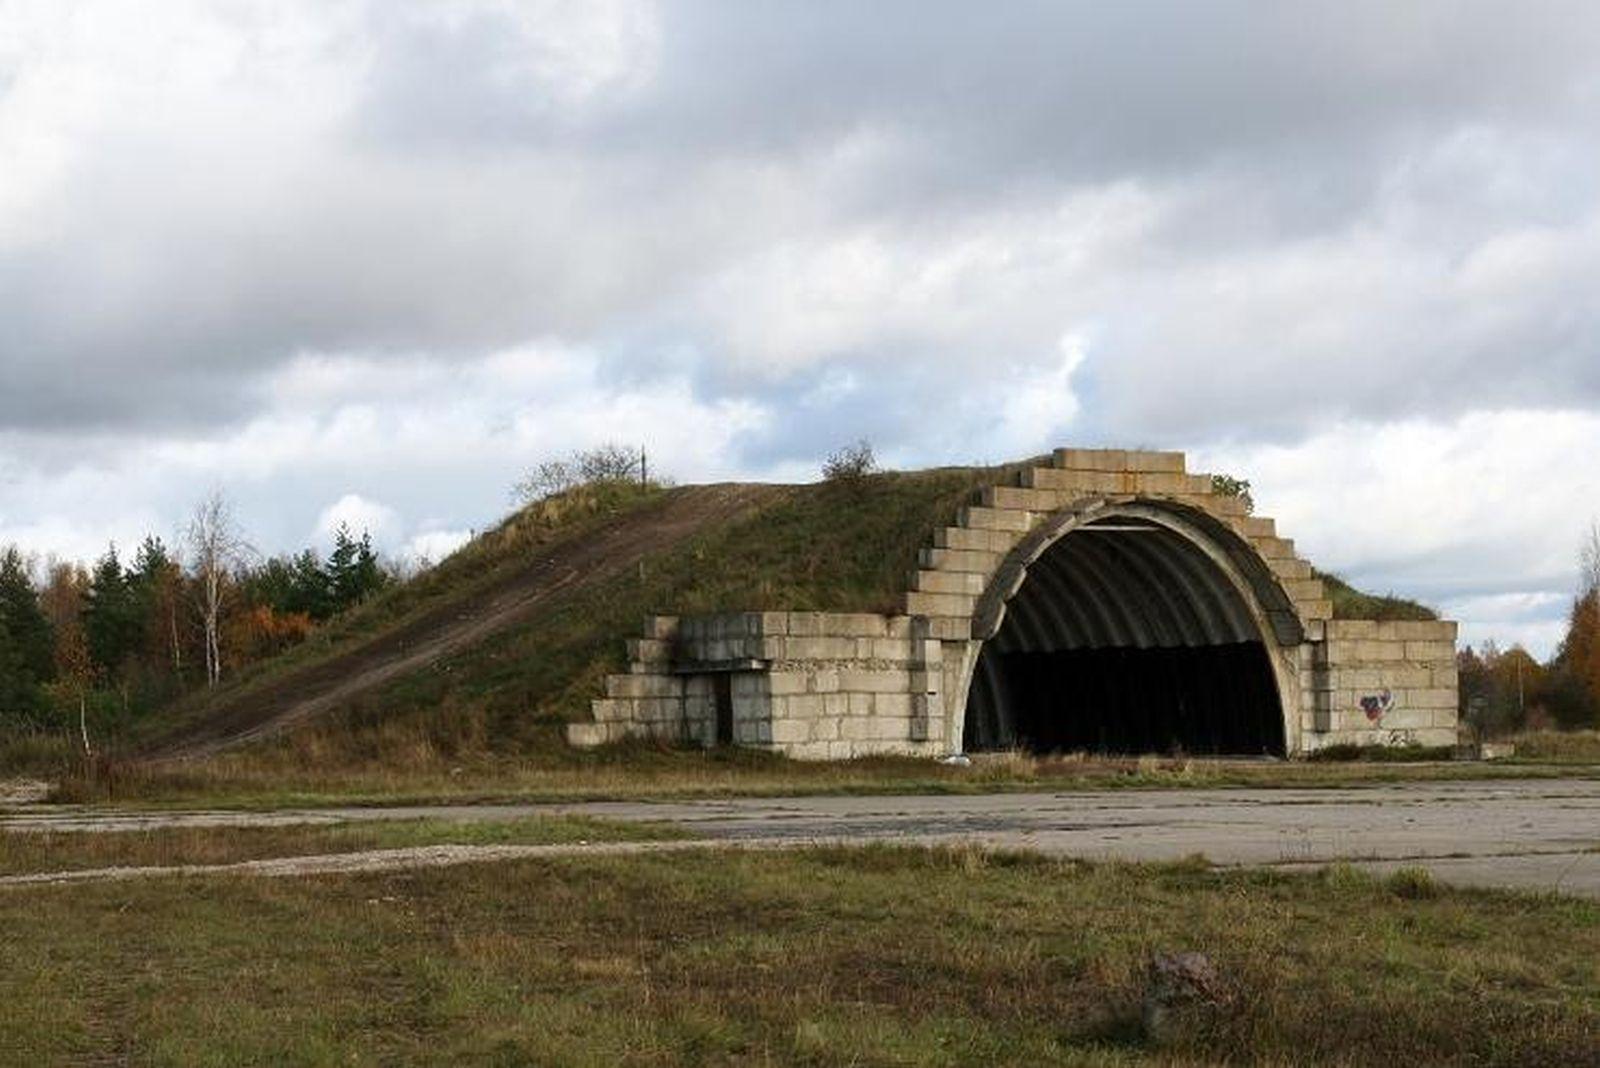 Kiltsi+airfield_